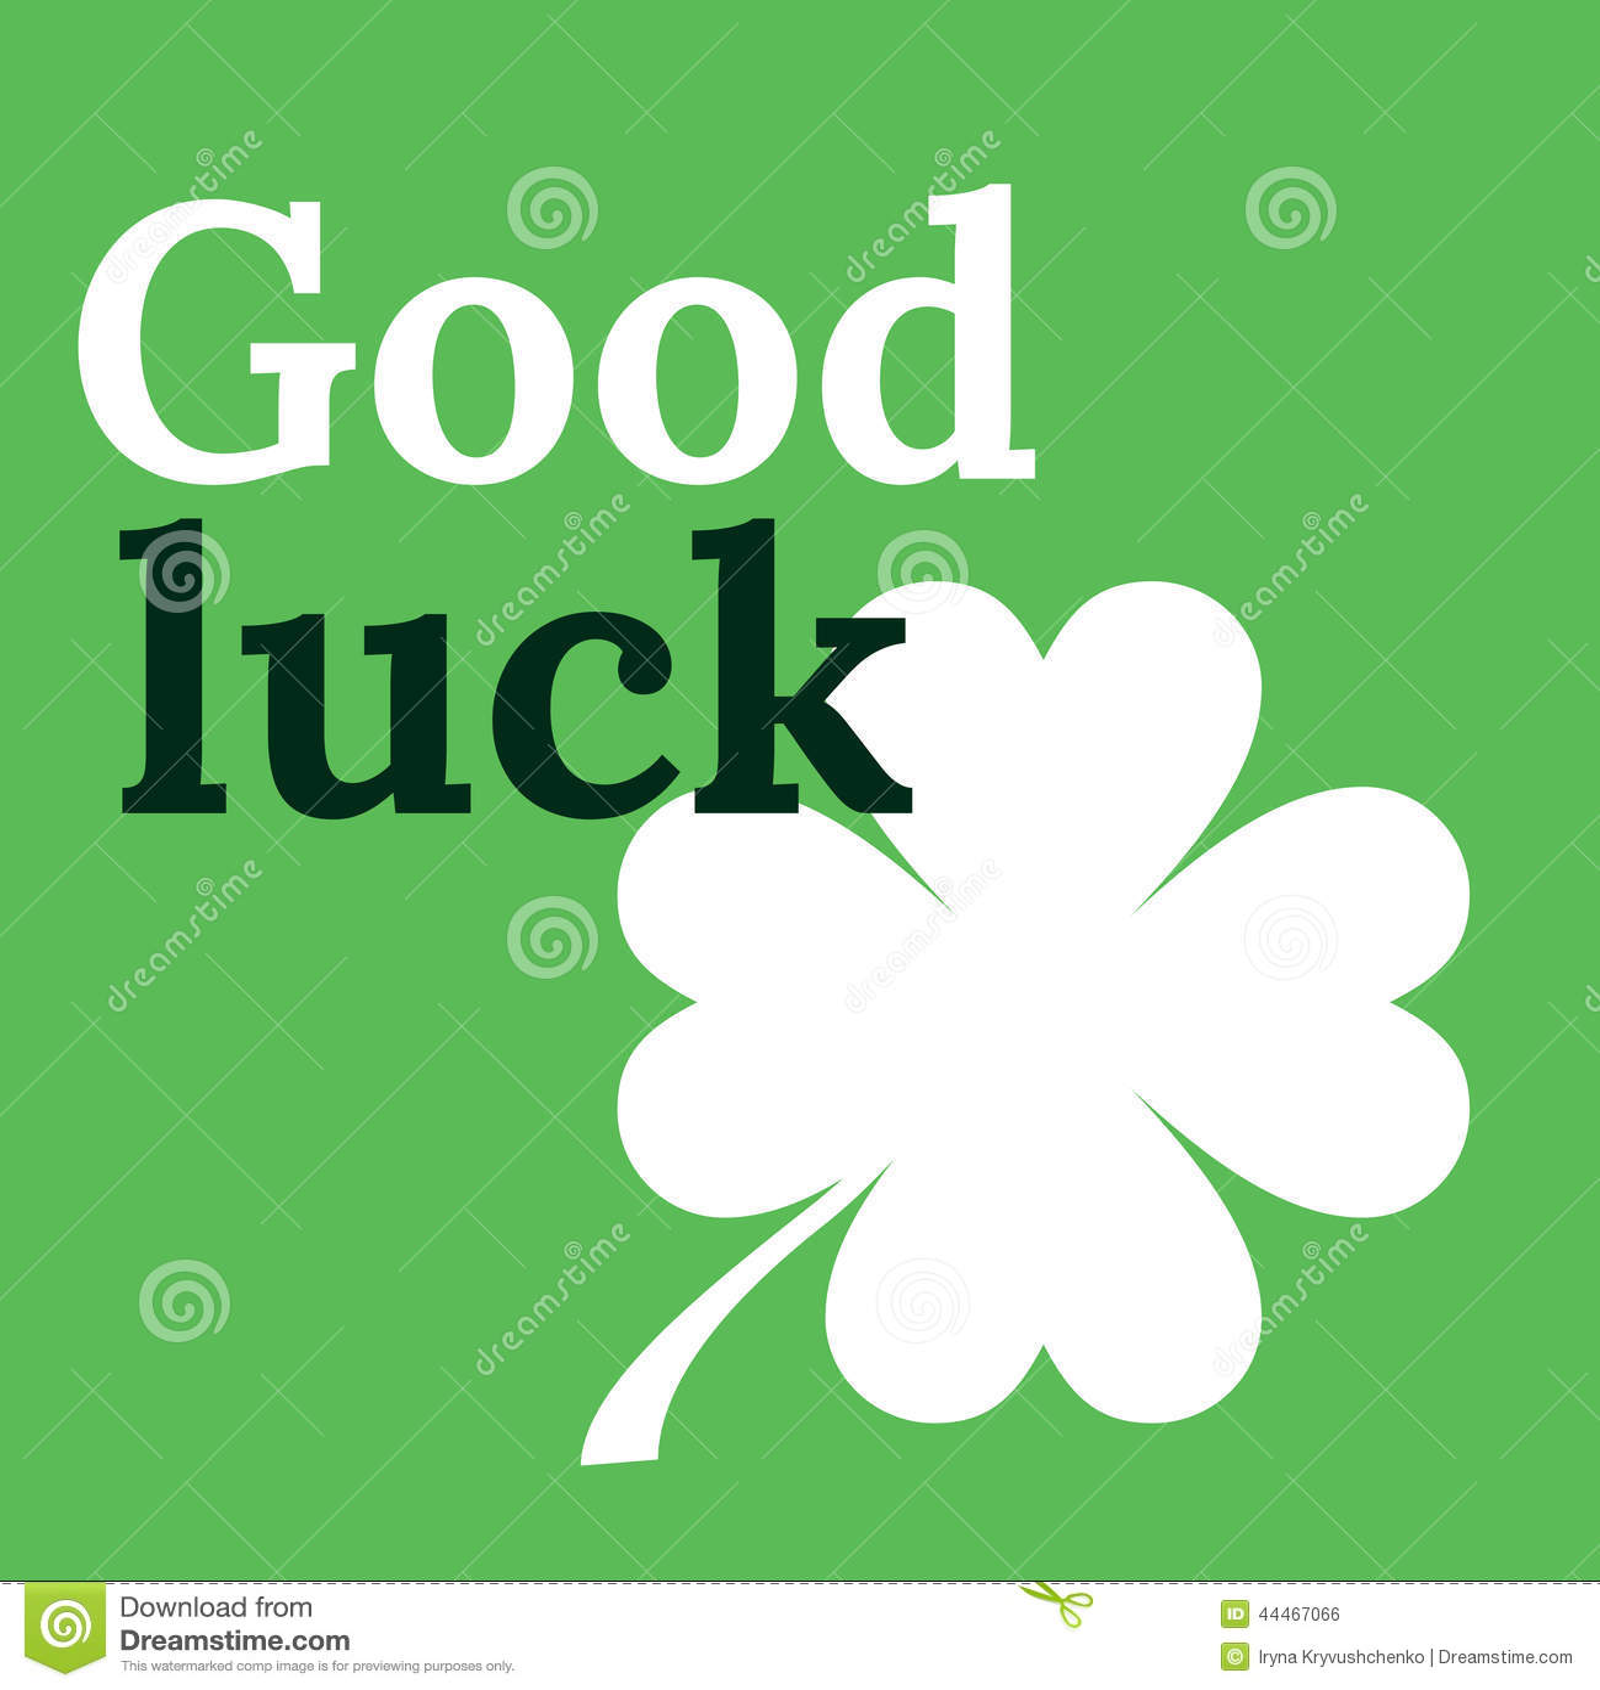 Good luck card with clover lucky symbol four leaf clover stock good luck card with clover lucky symbol four leaf clover buycottarizona